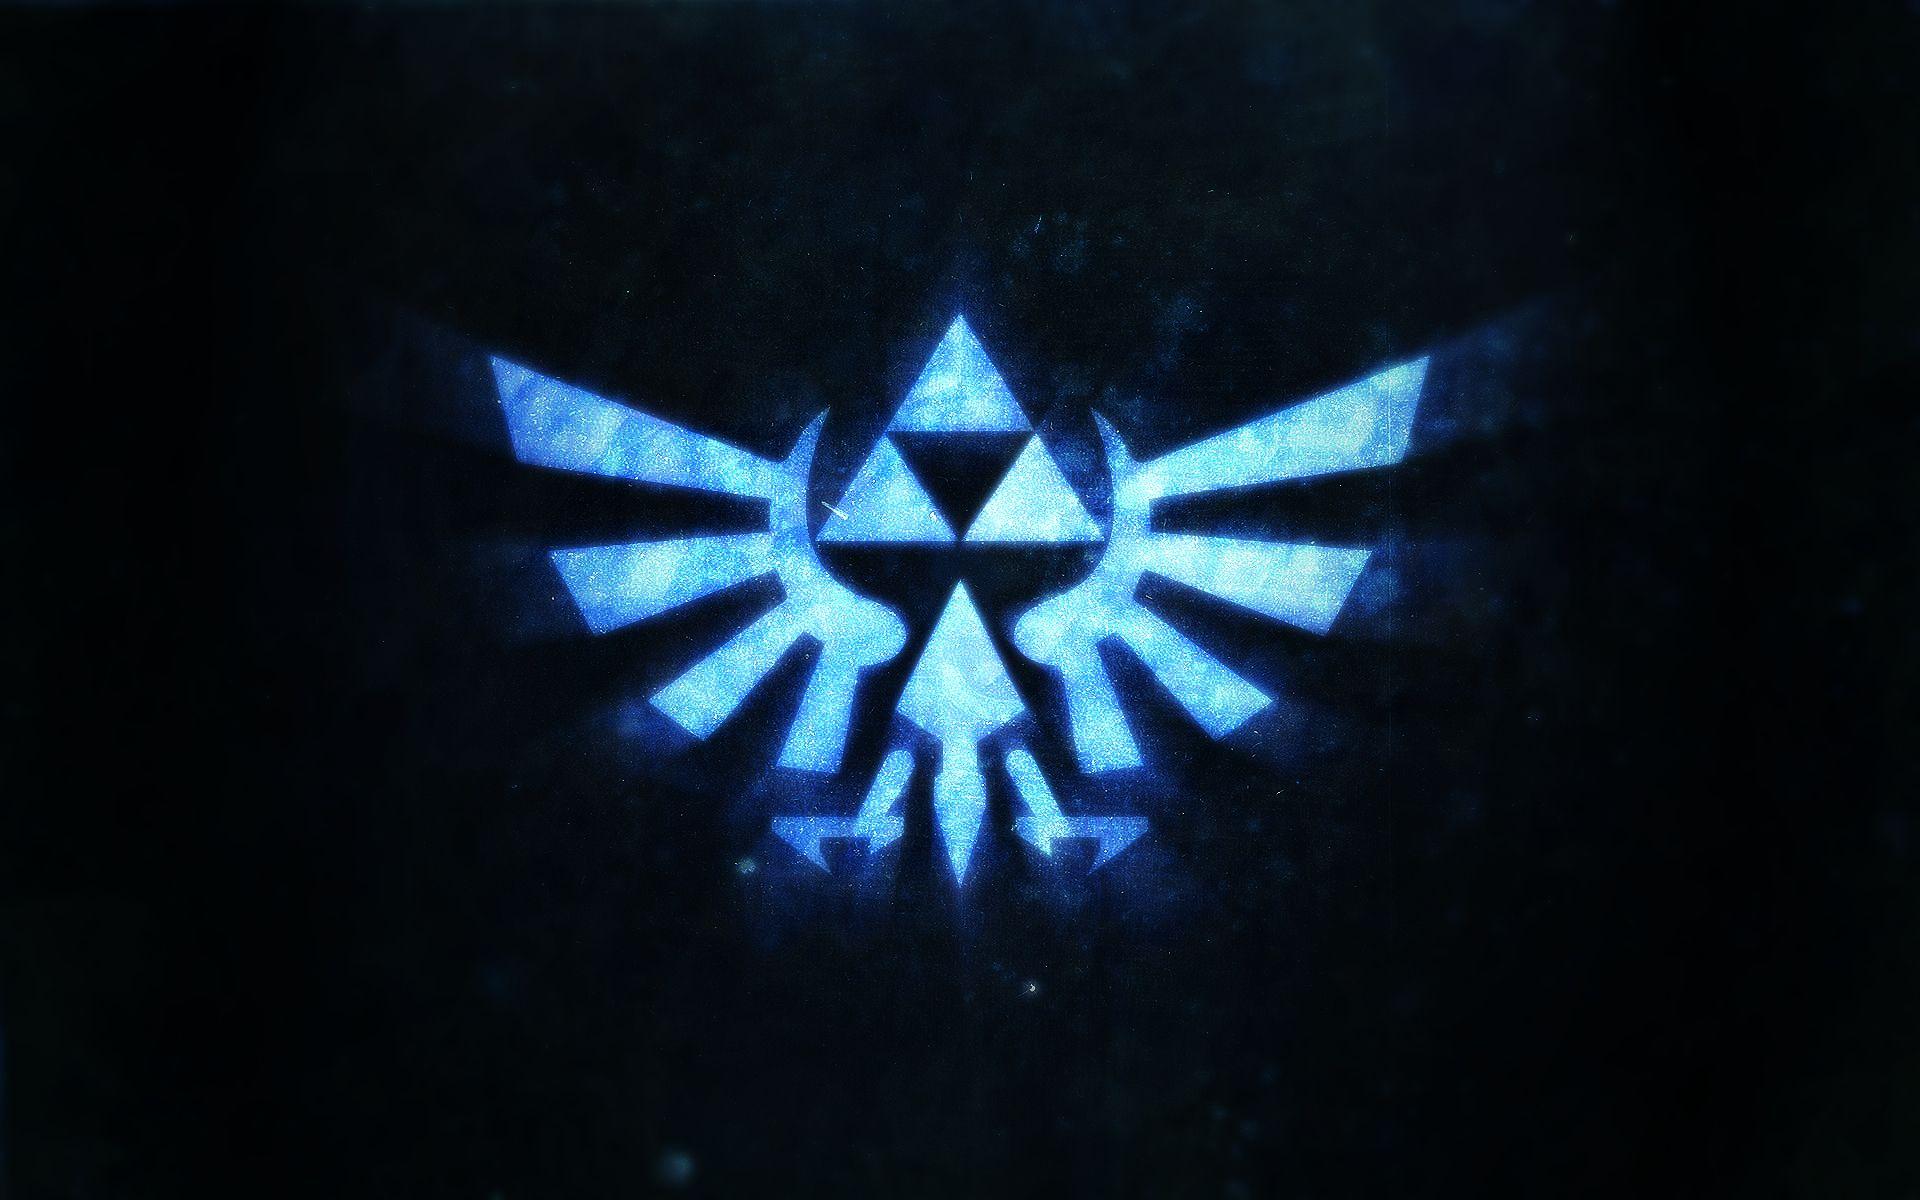 The legend of Zelda triforce.